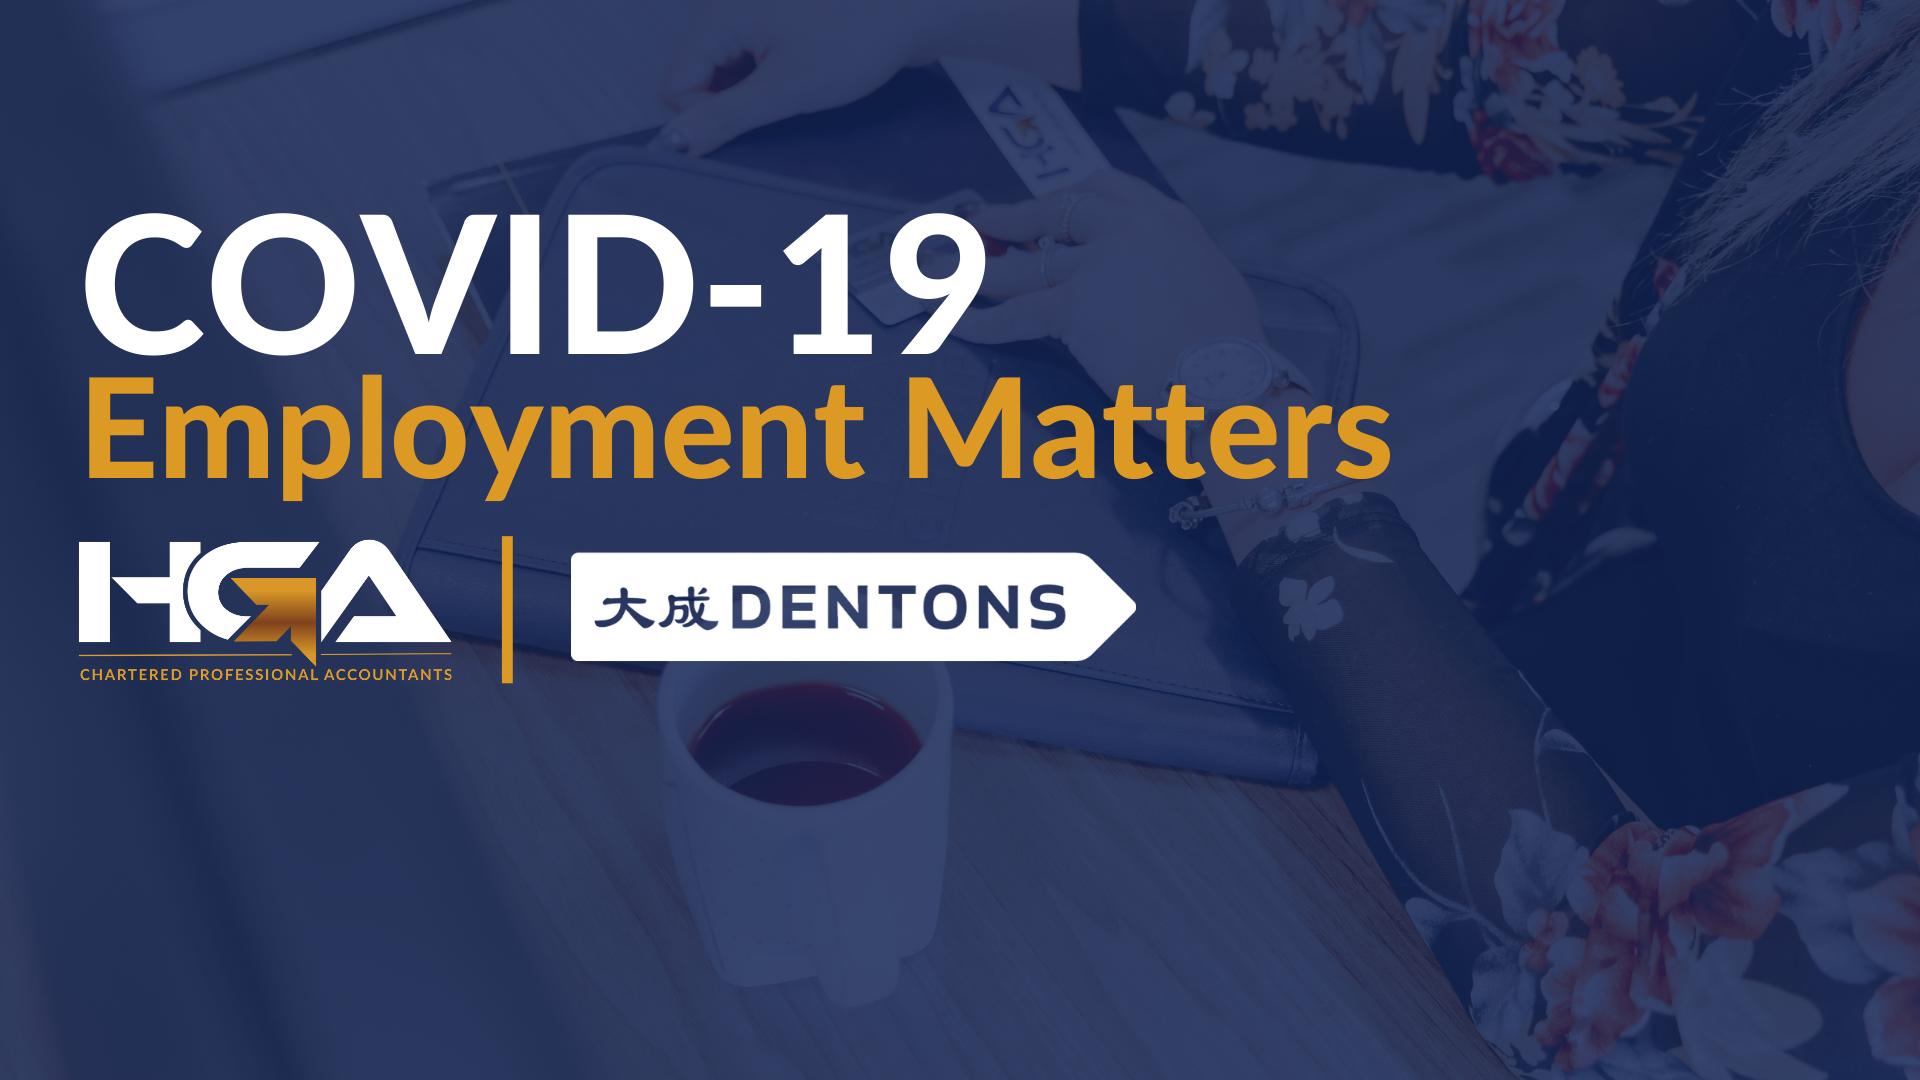 COVID-19 Employment Matters Webinar: March 24, 2020